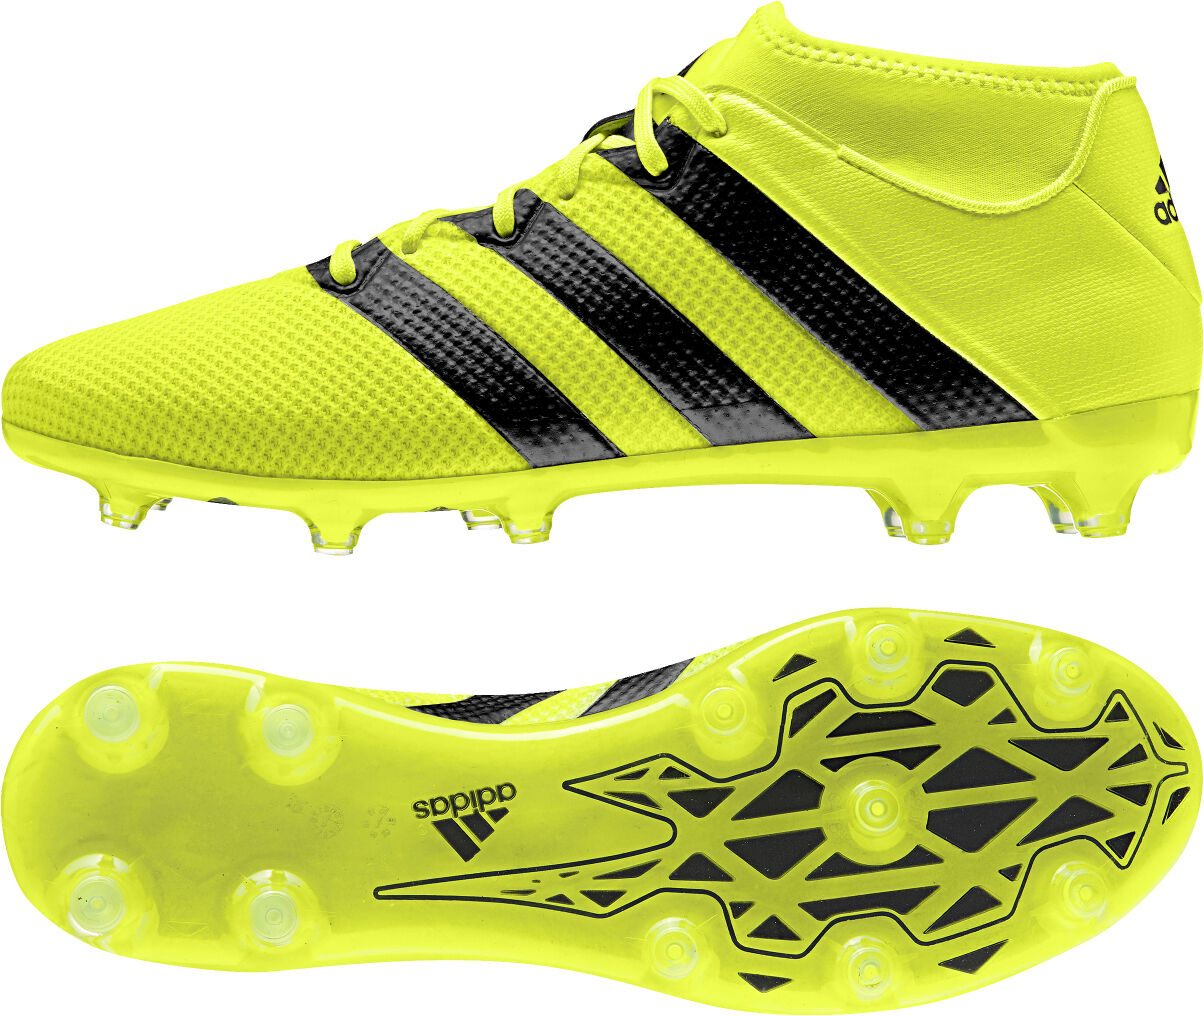 Adidas Ace 16.2 primemesh FG ag zapatos botas de futbol fútbol aq3450 top